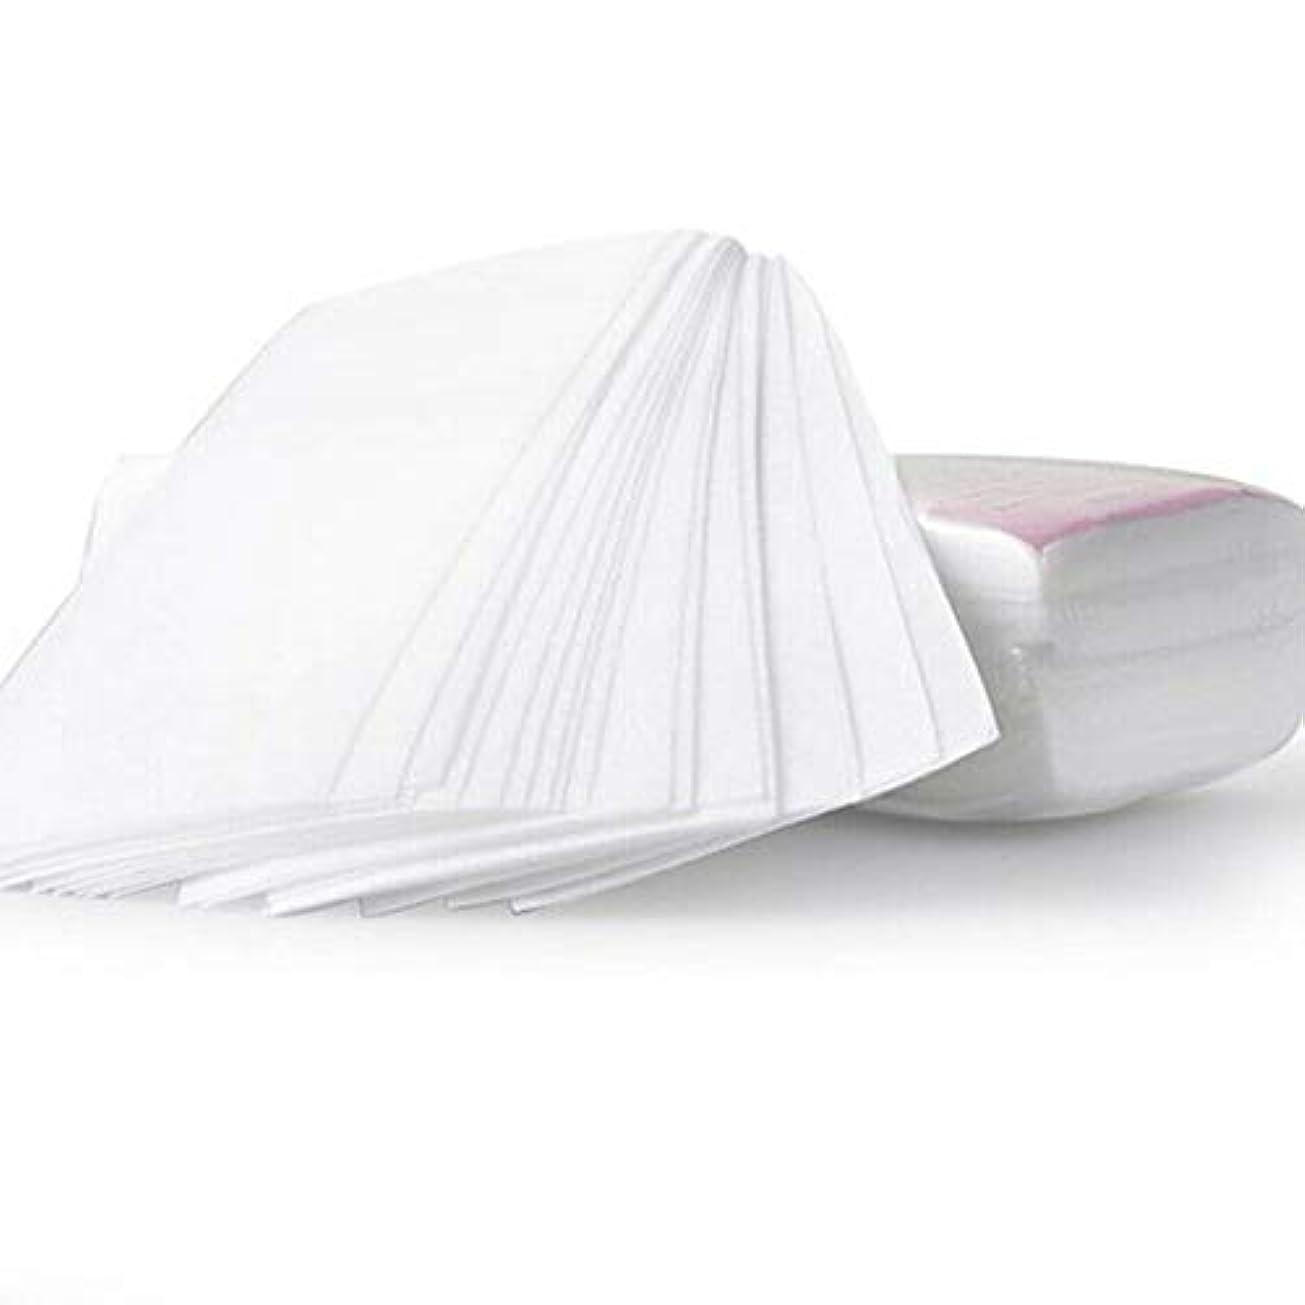 LULAA ワックス脱毛紙 脱毛シート 衛生 使い捨て 迅速かつ簡単 痛い感じがなく 100枚